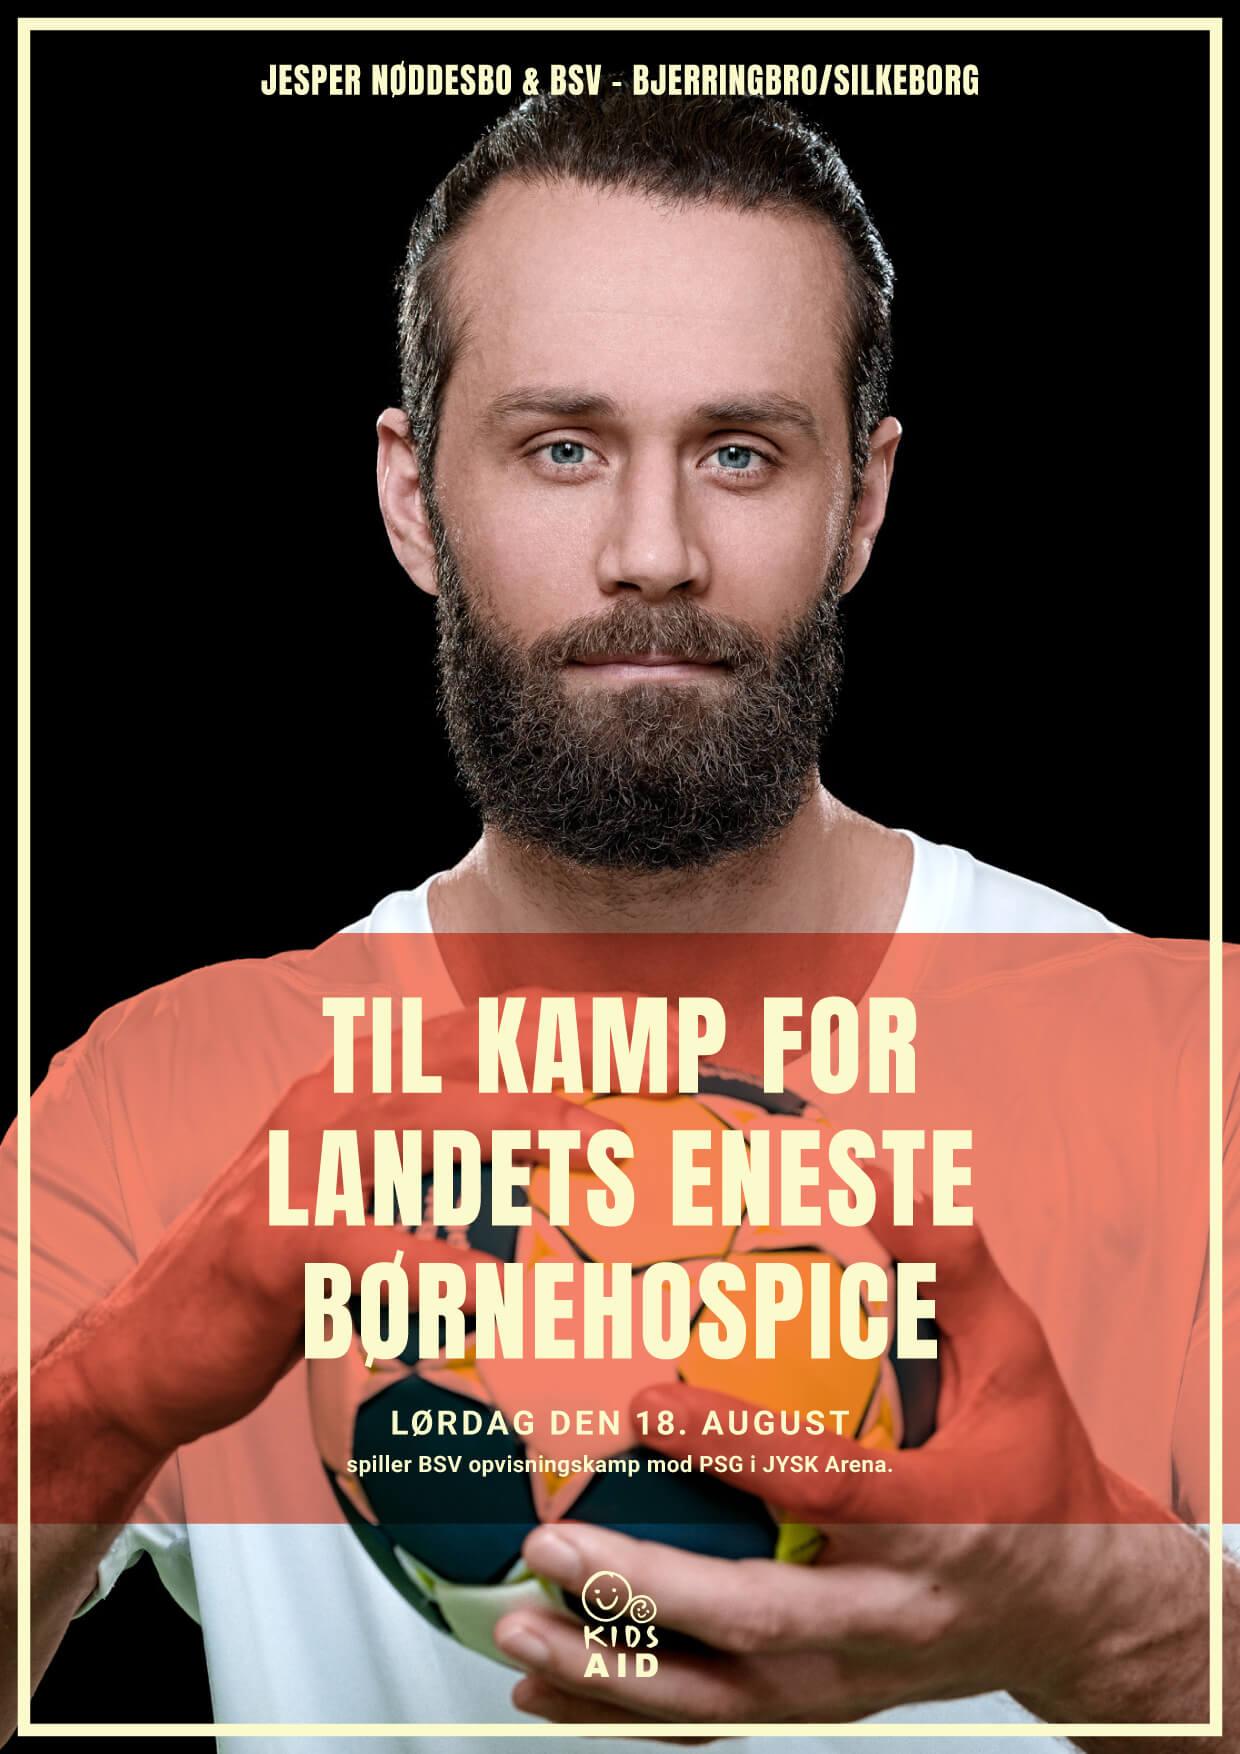 Invitation_Jesper_noddesbo